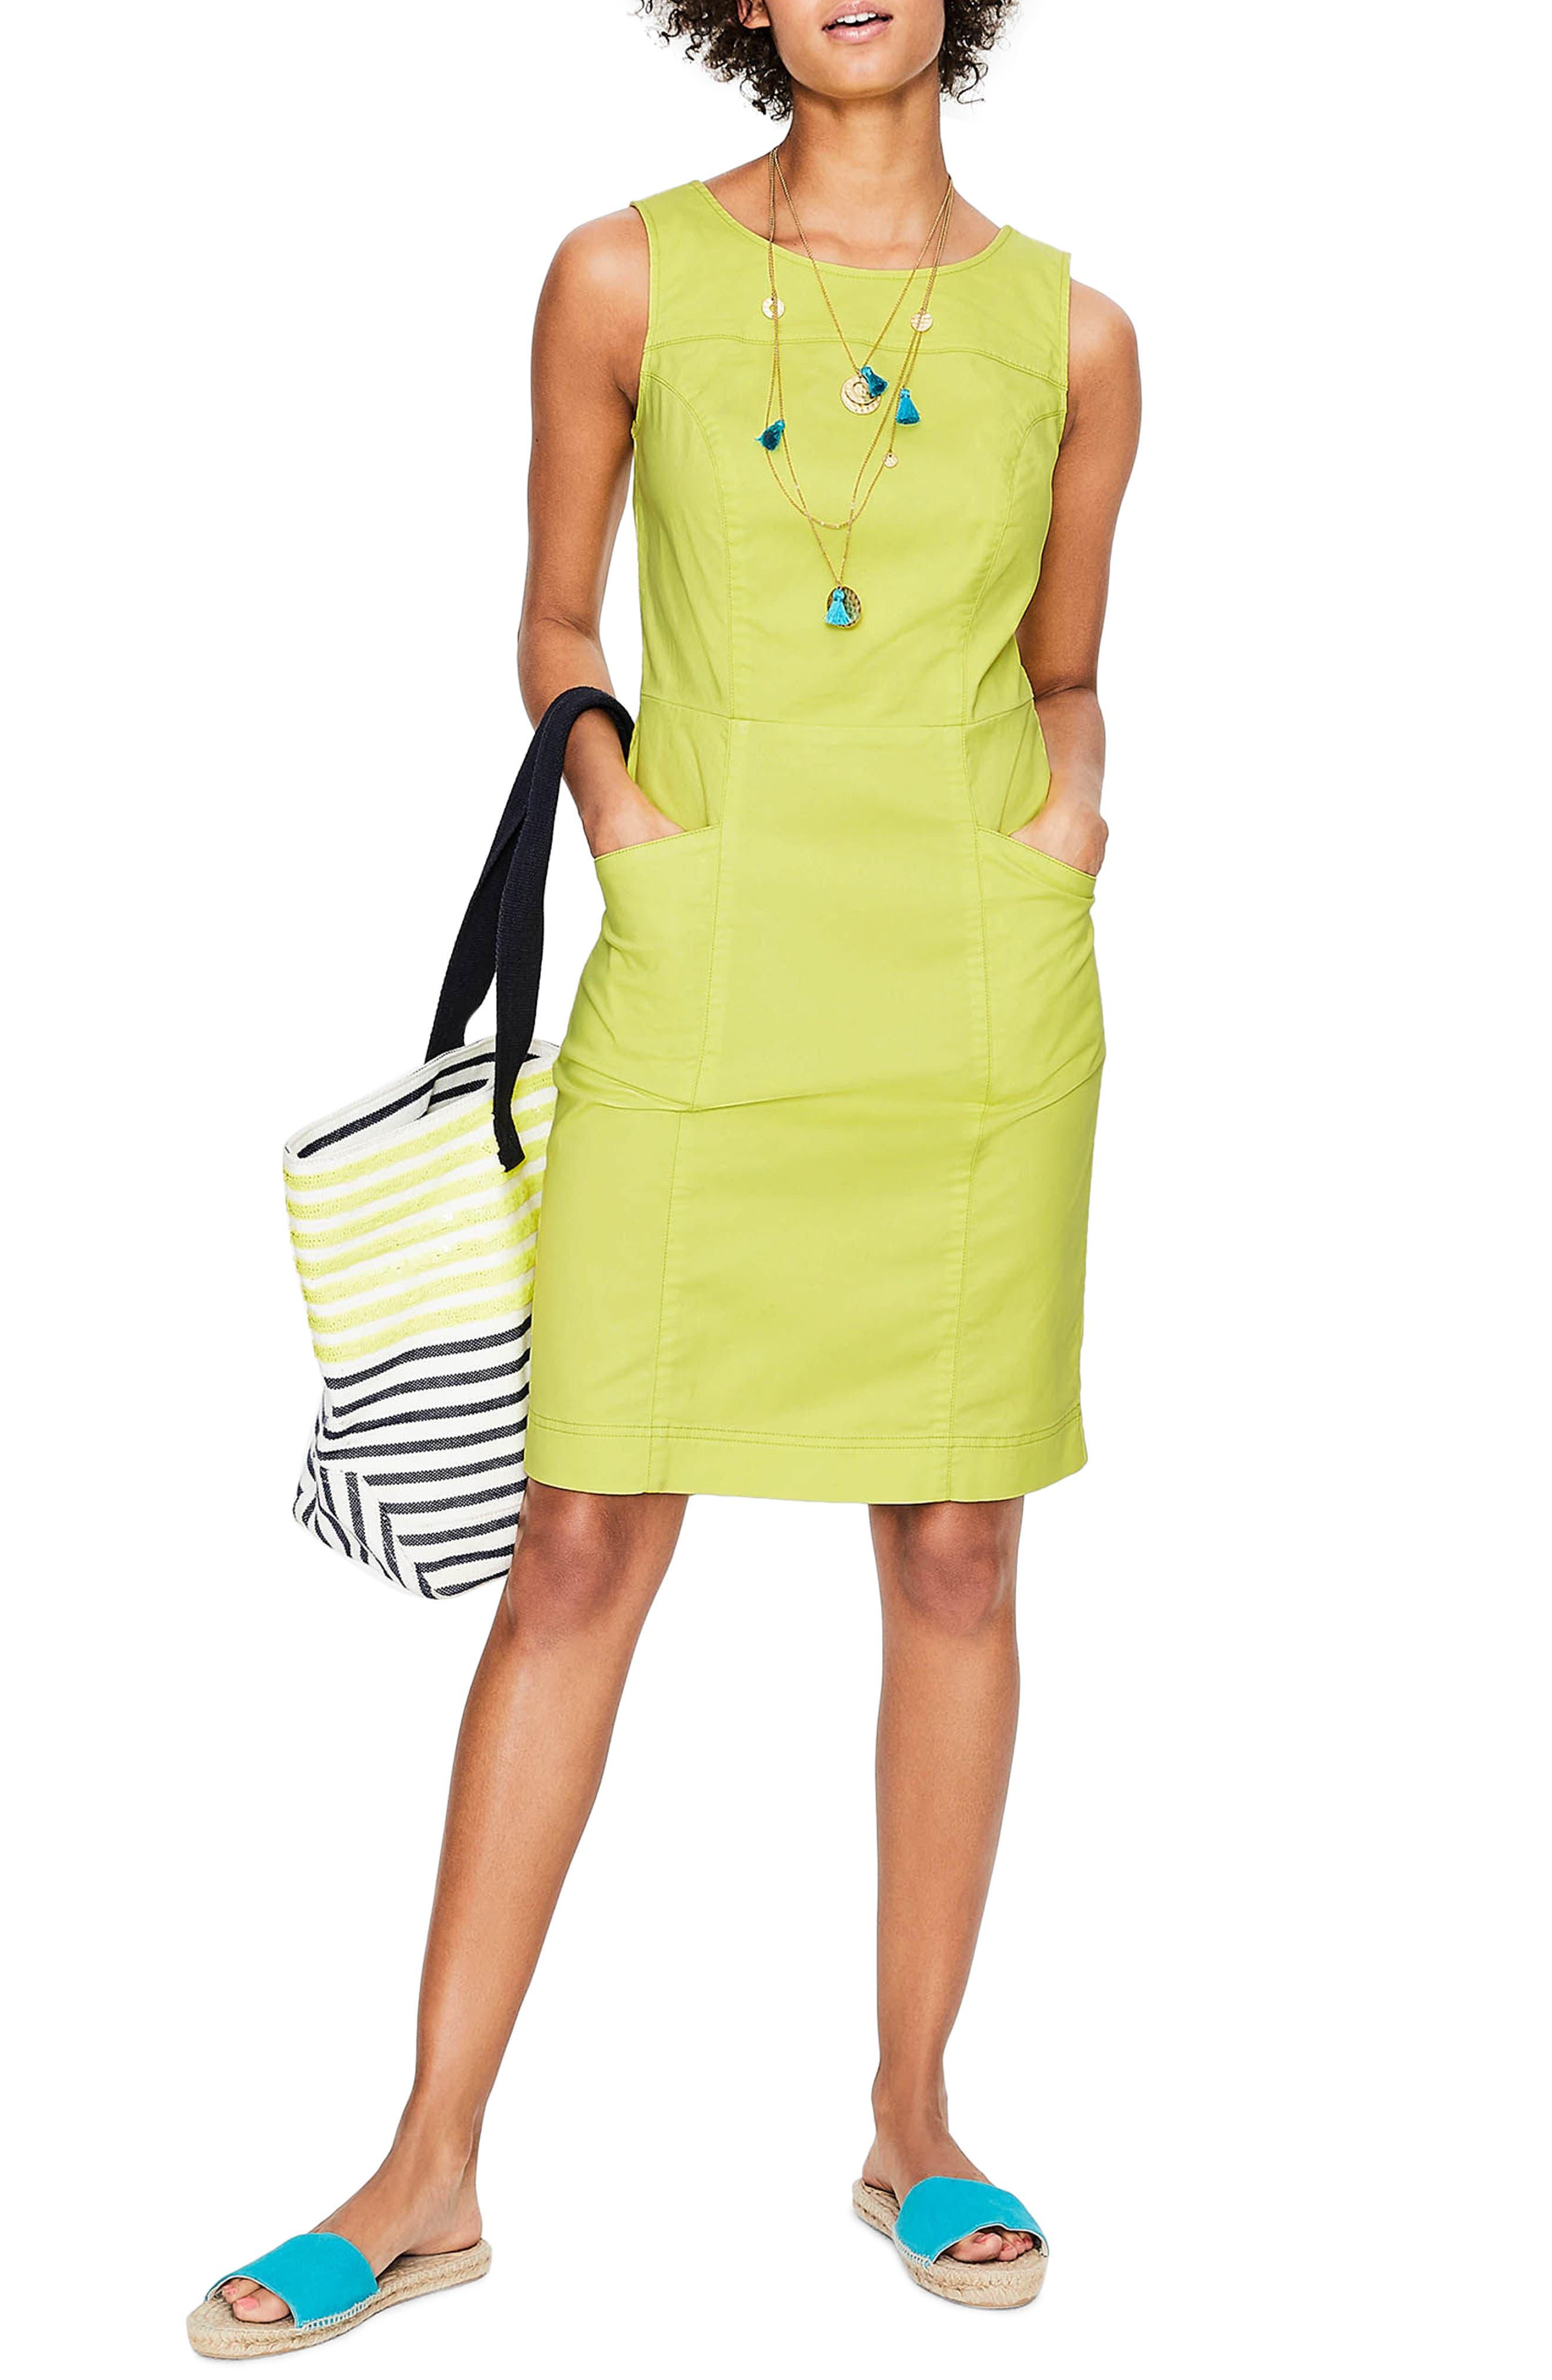 Boden Tamara Stretch Cotton Sleeveless Dress